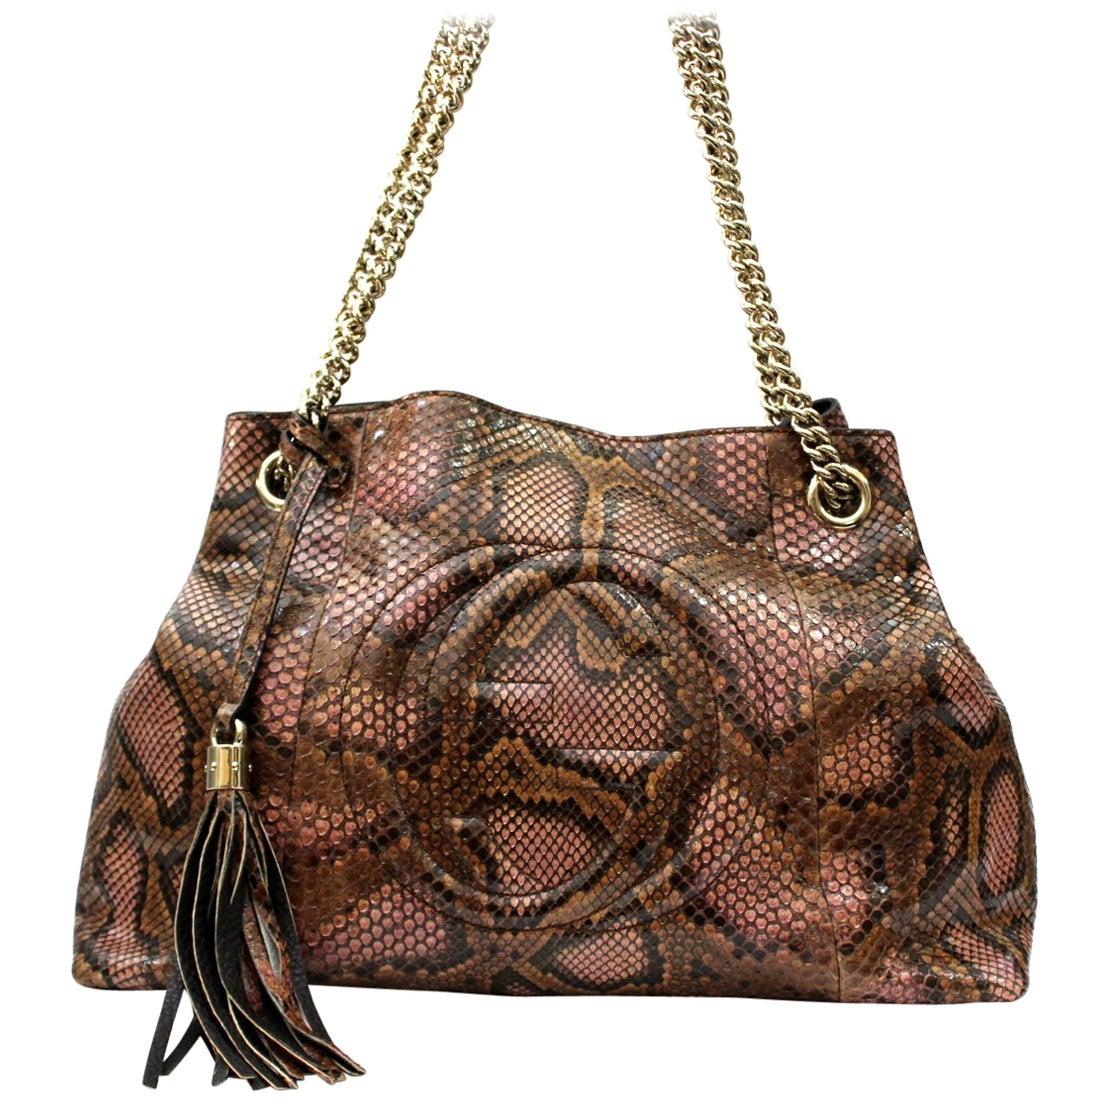 Gucci Leather Soho Bag